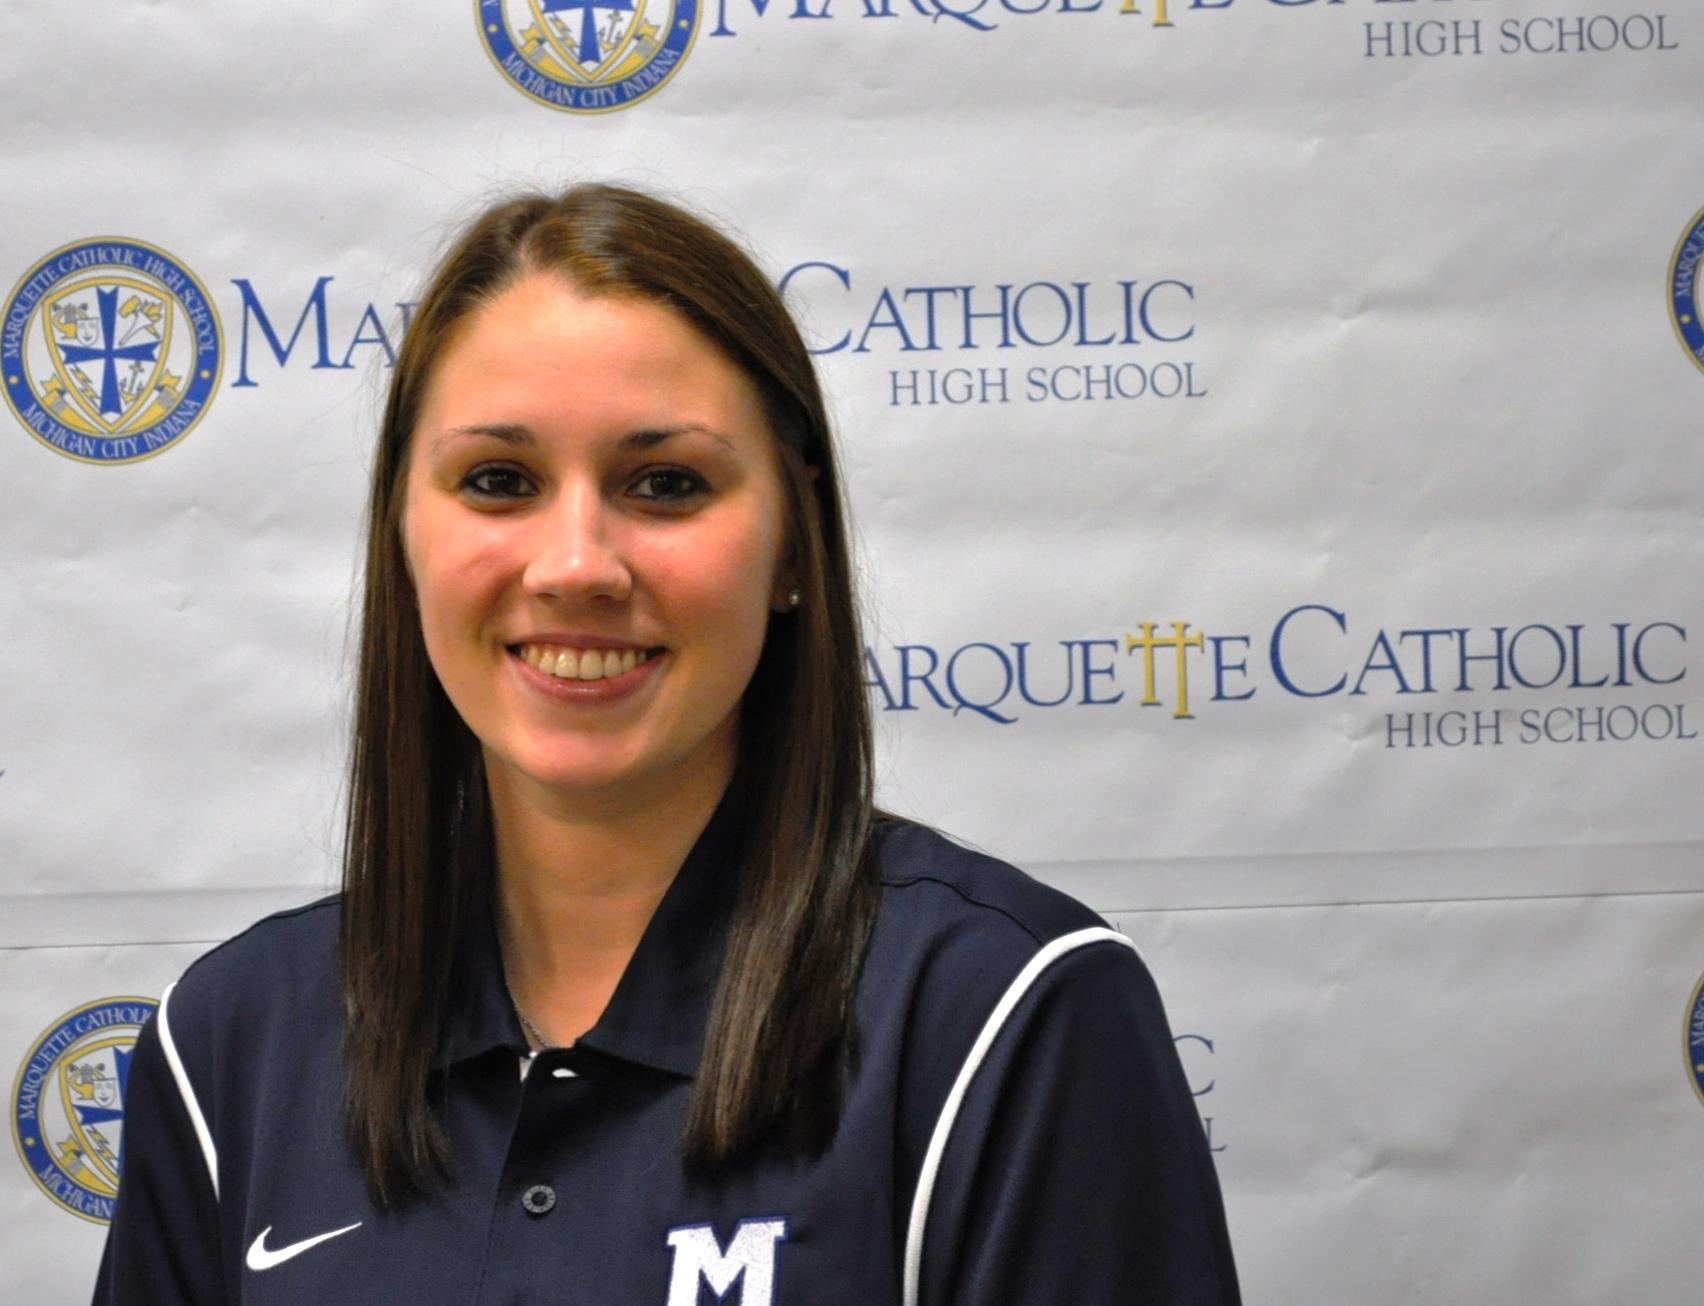 Marquette Catholic High School Hires Chesterton Grad for Lady Blazer Basketball